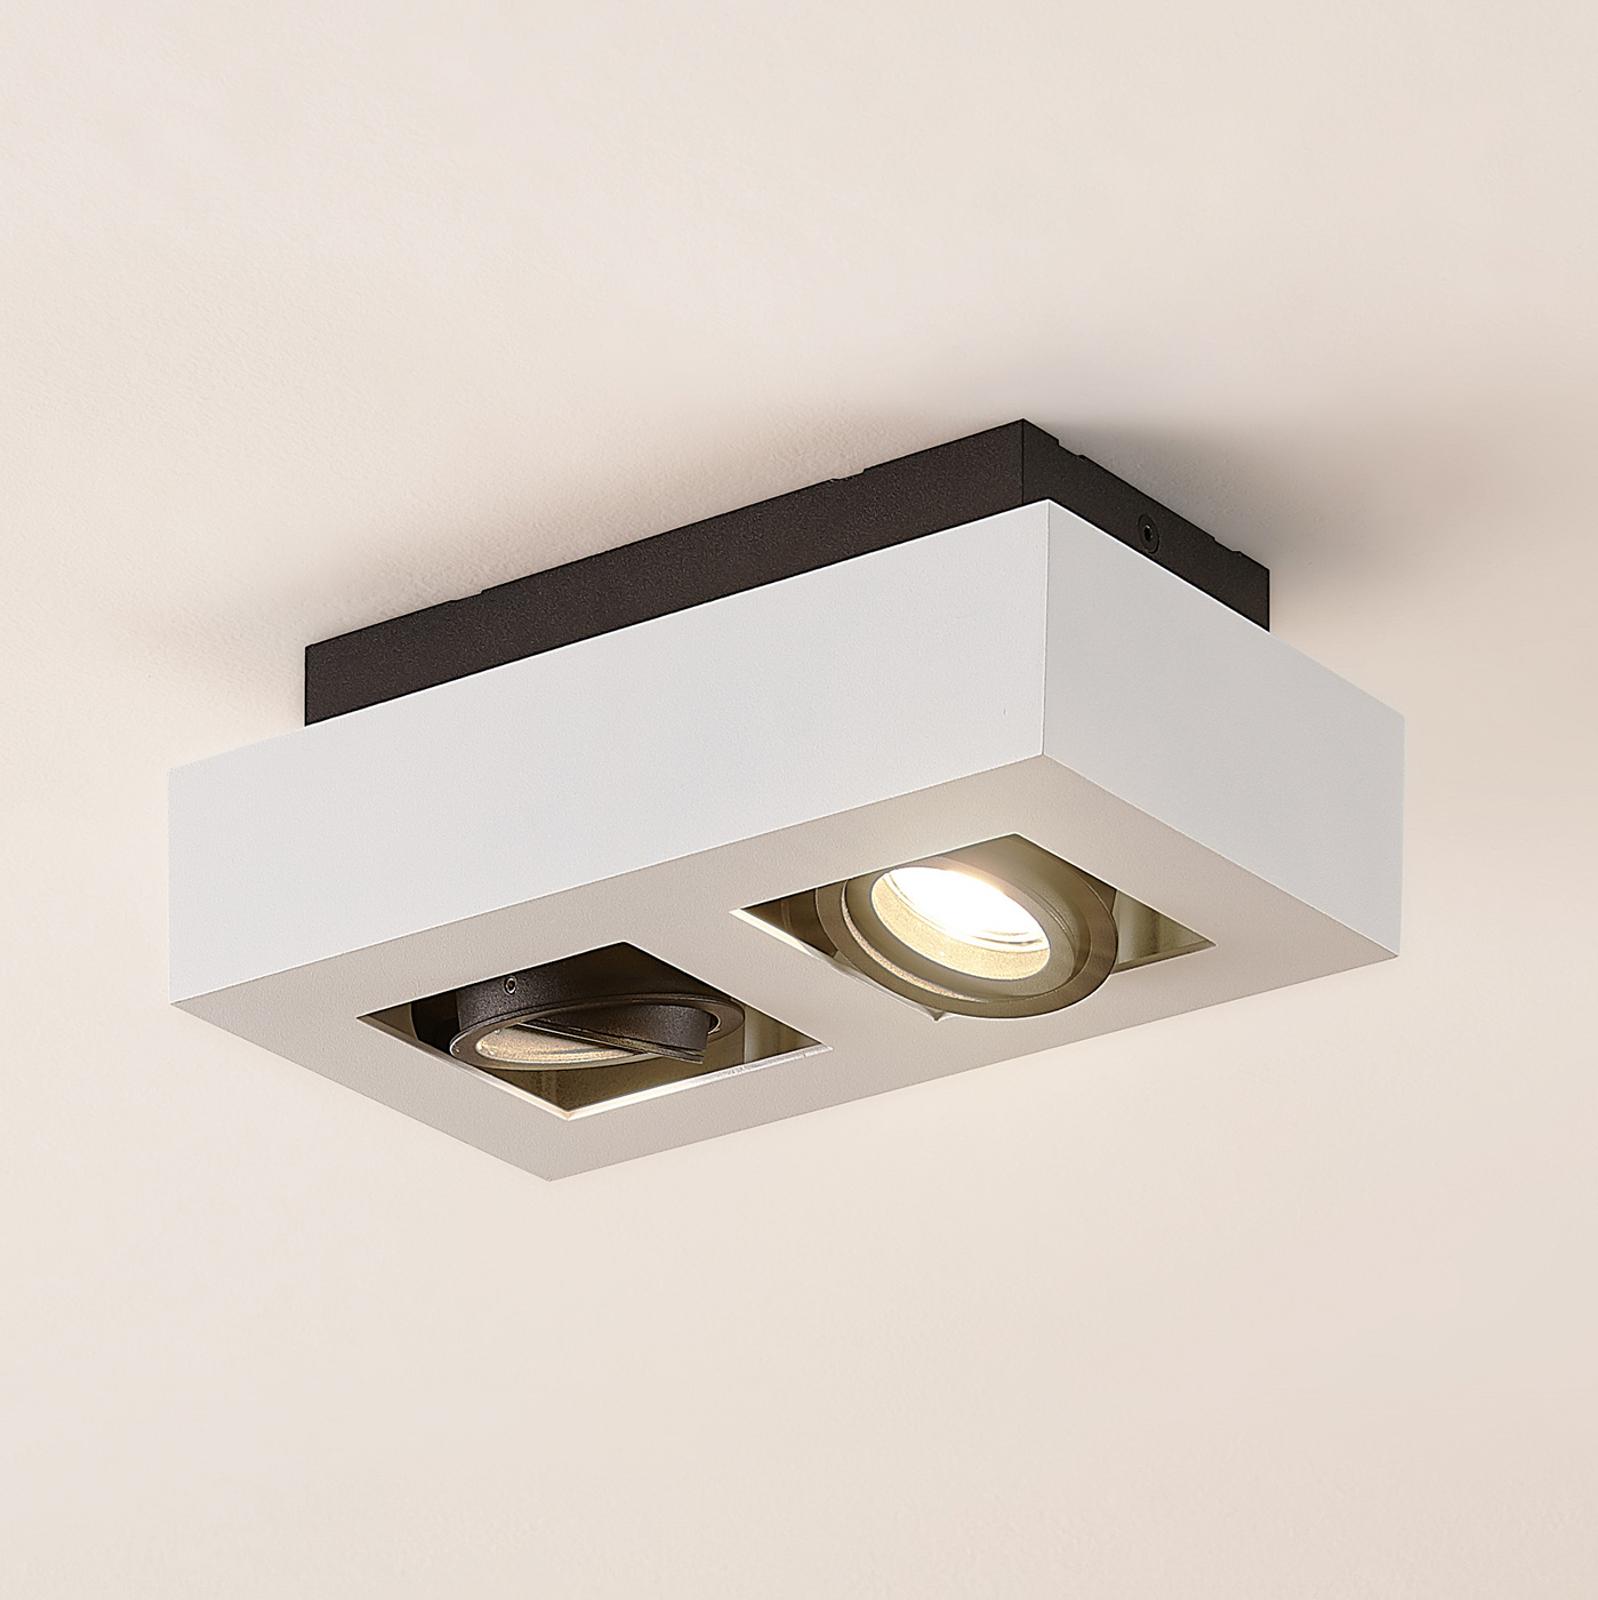 Arcchio Vince lampa sufitowa, 25 x 14 cm biała